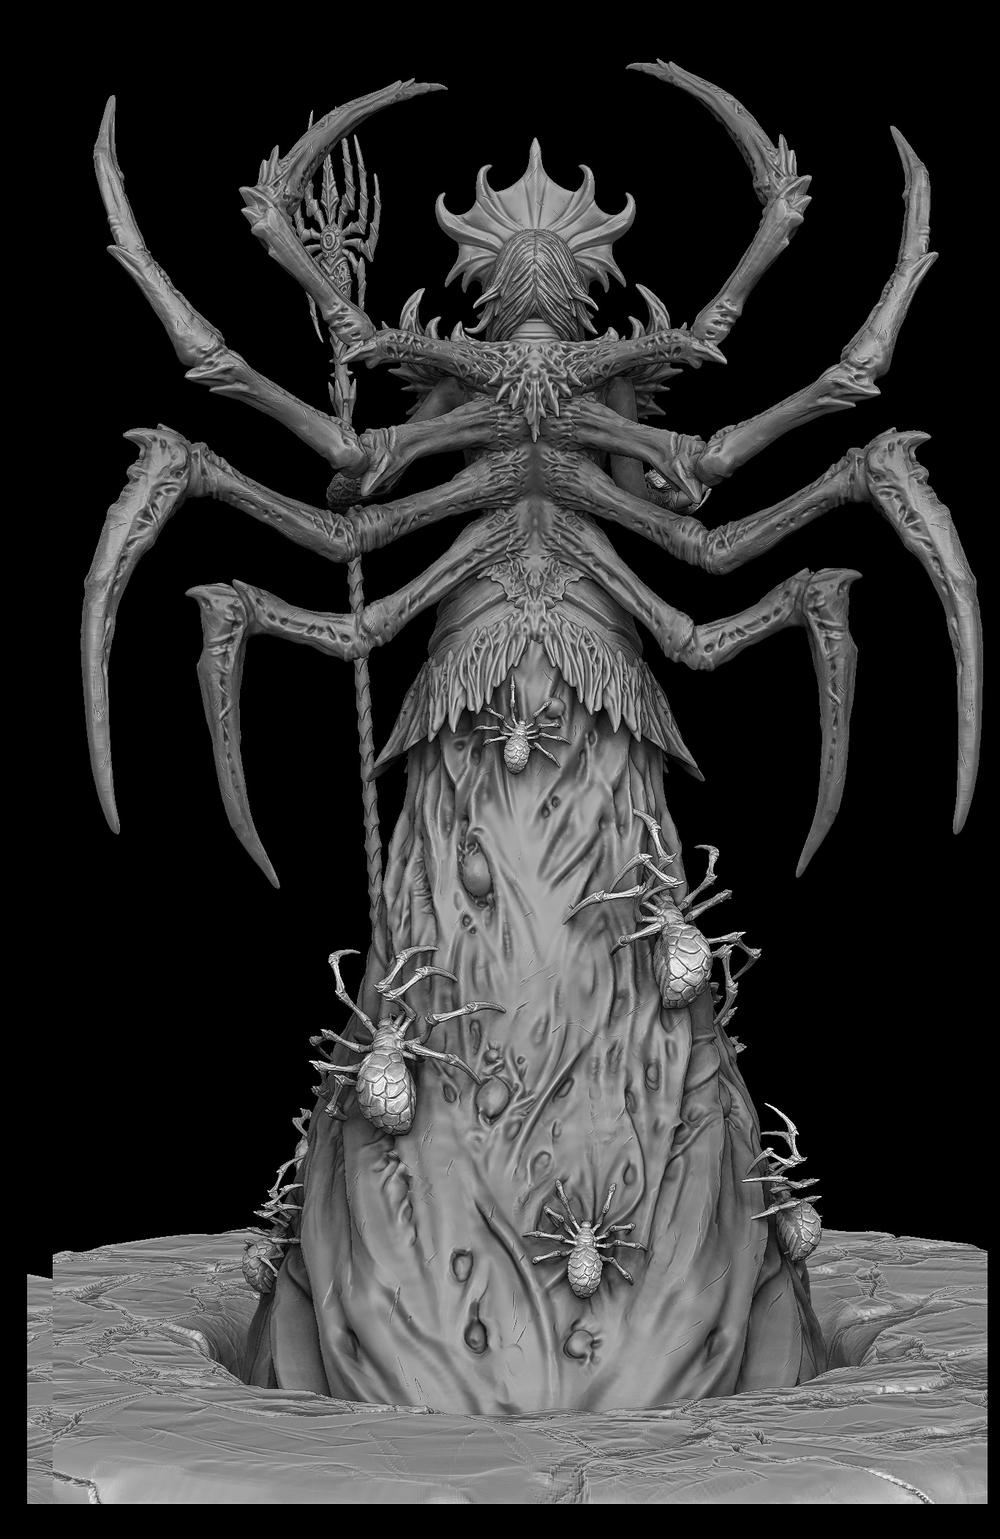 Mephala3_Elder_Scrolls_Online.jpg